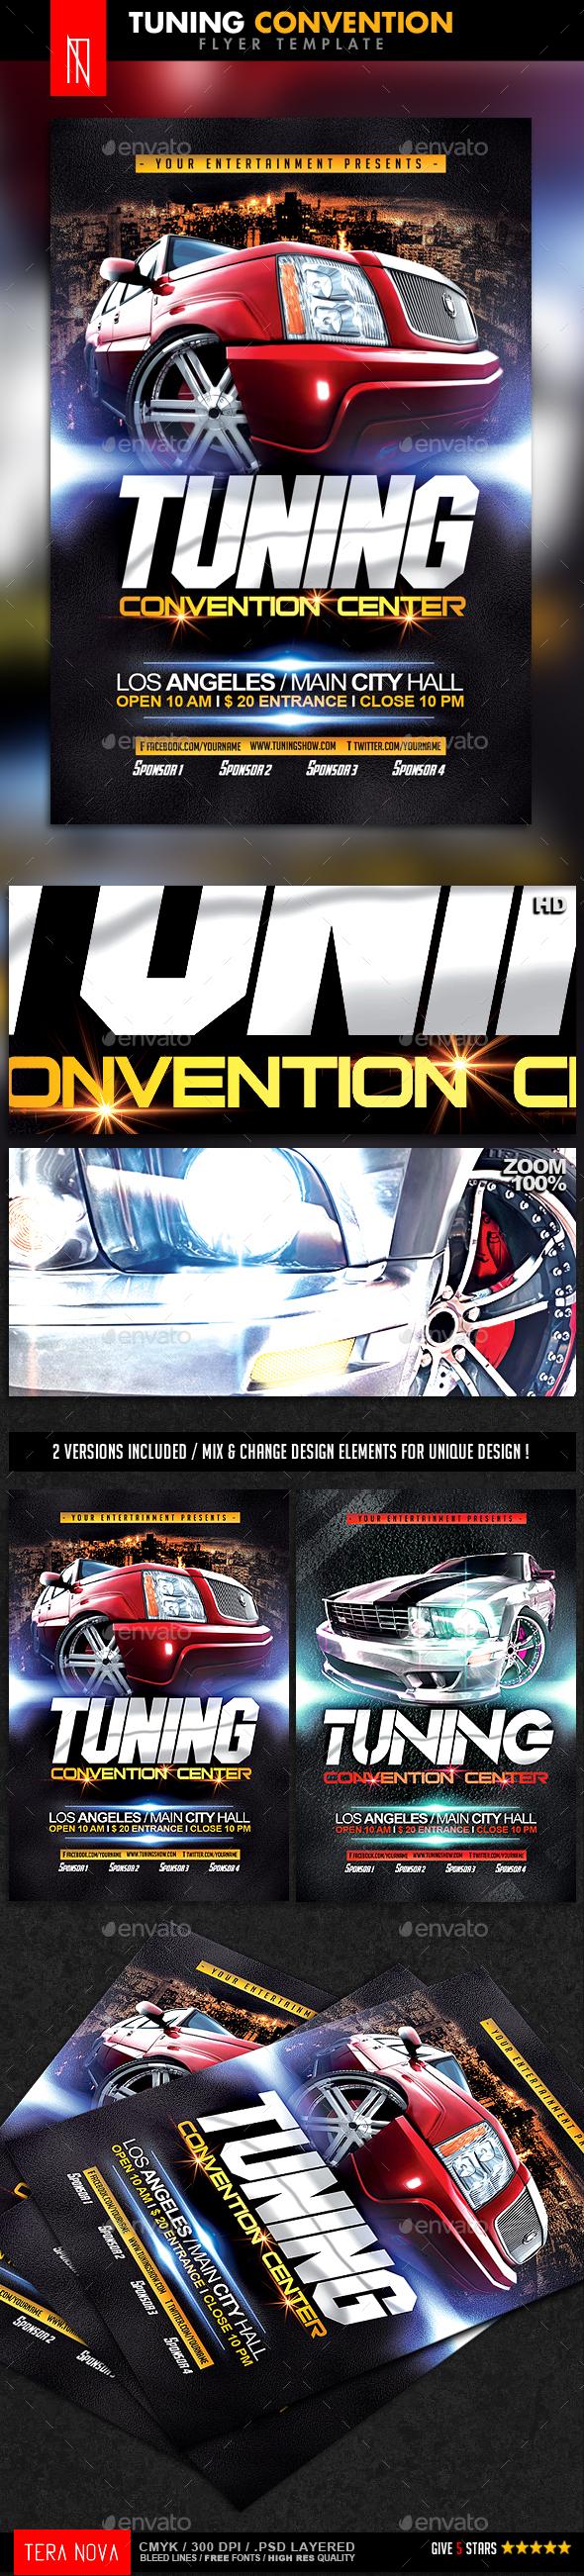 Car Show Flyer Template – Car Show Flyer Template